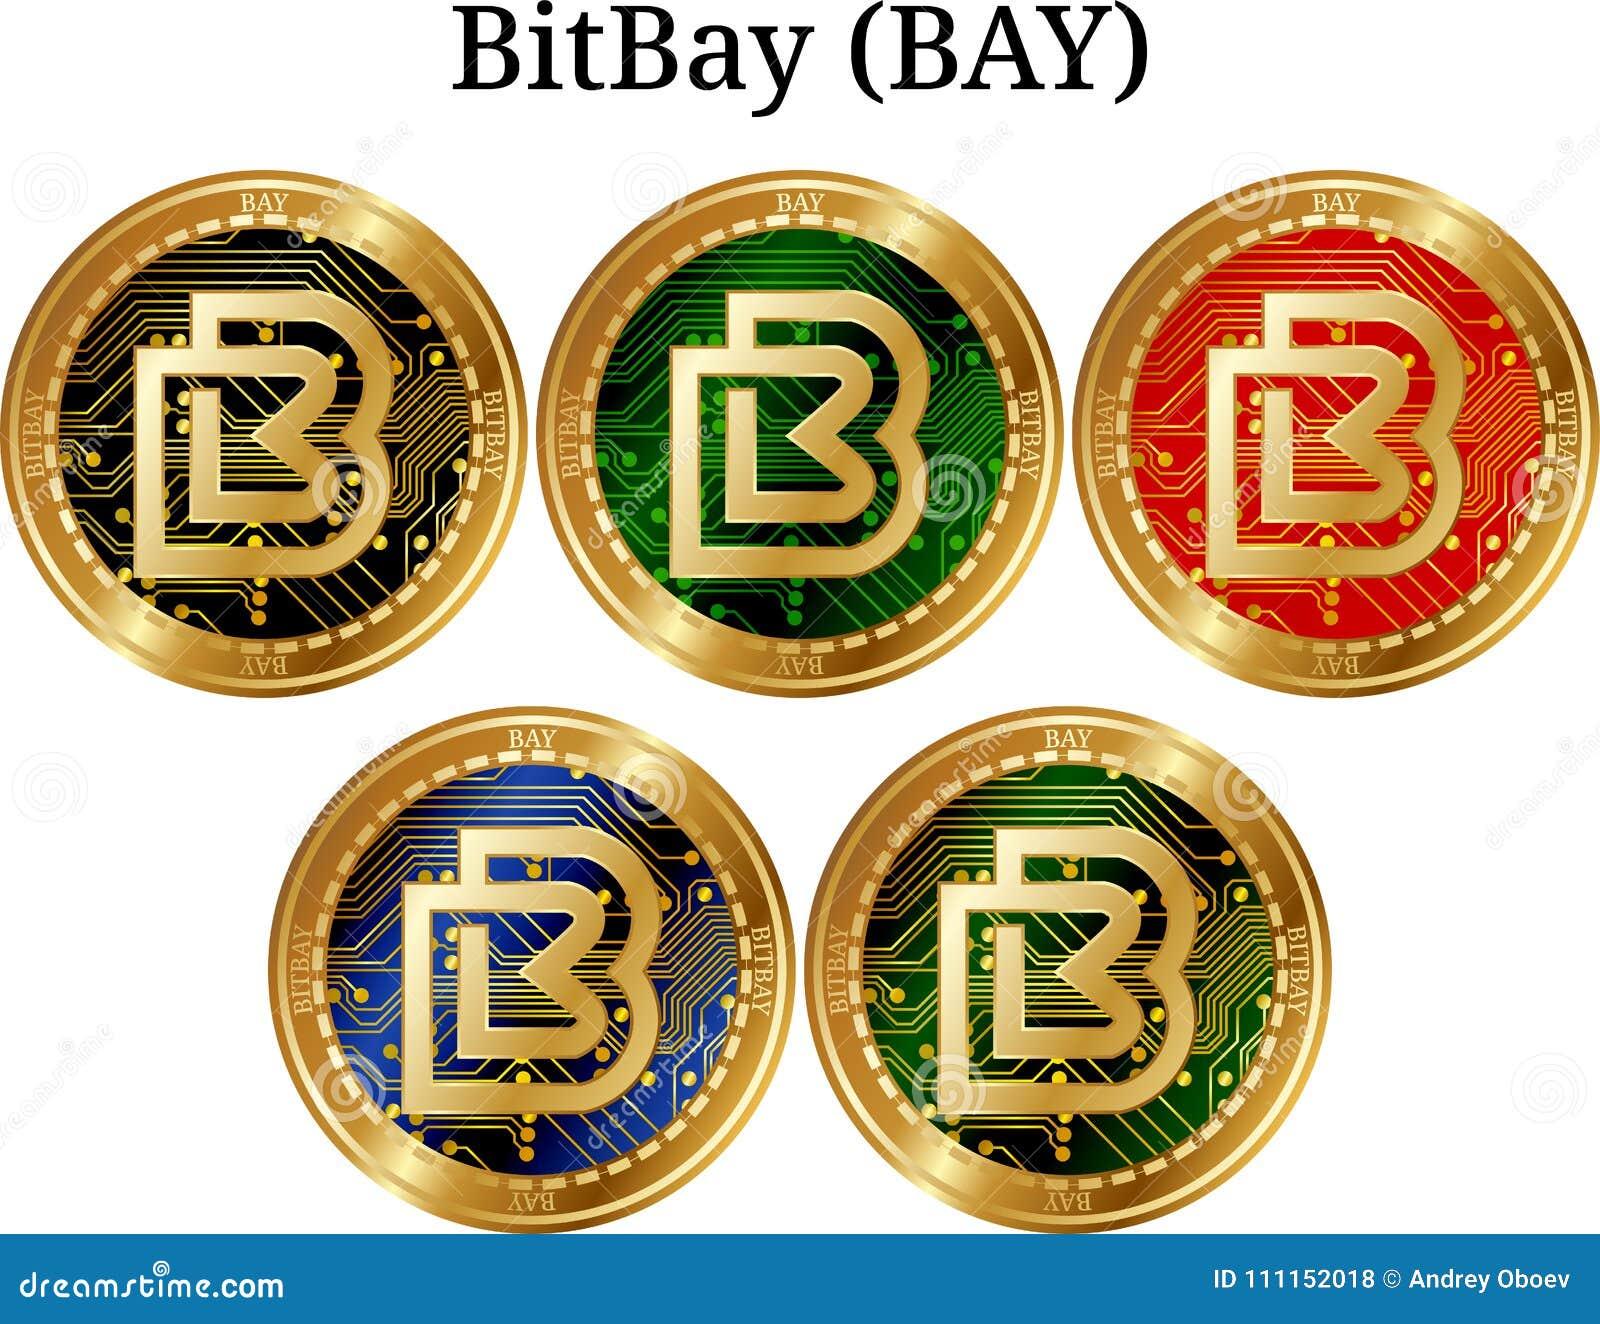 bitbay coin